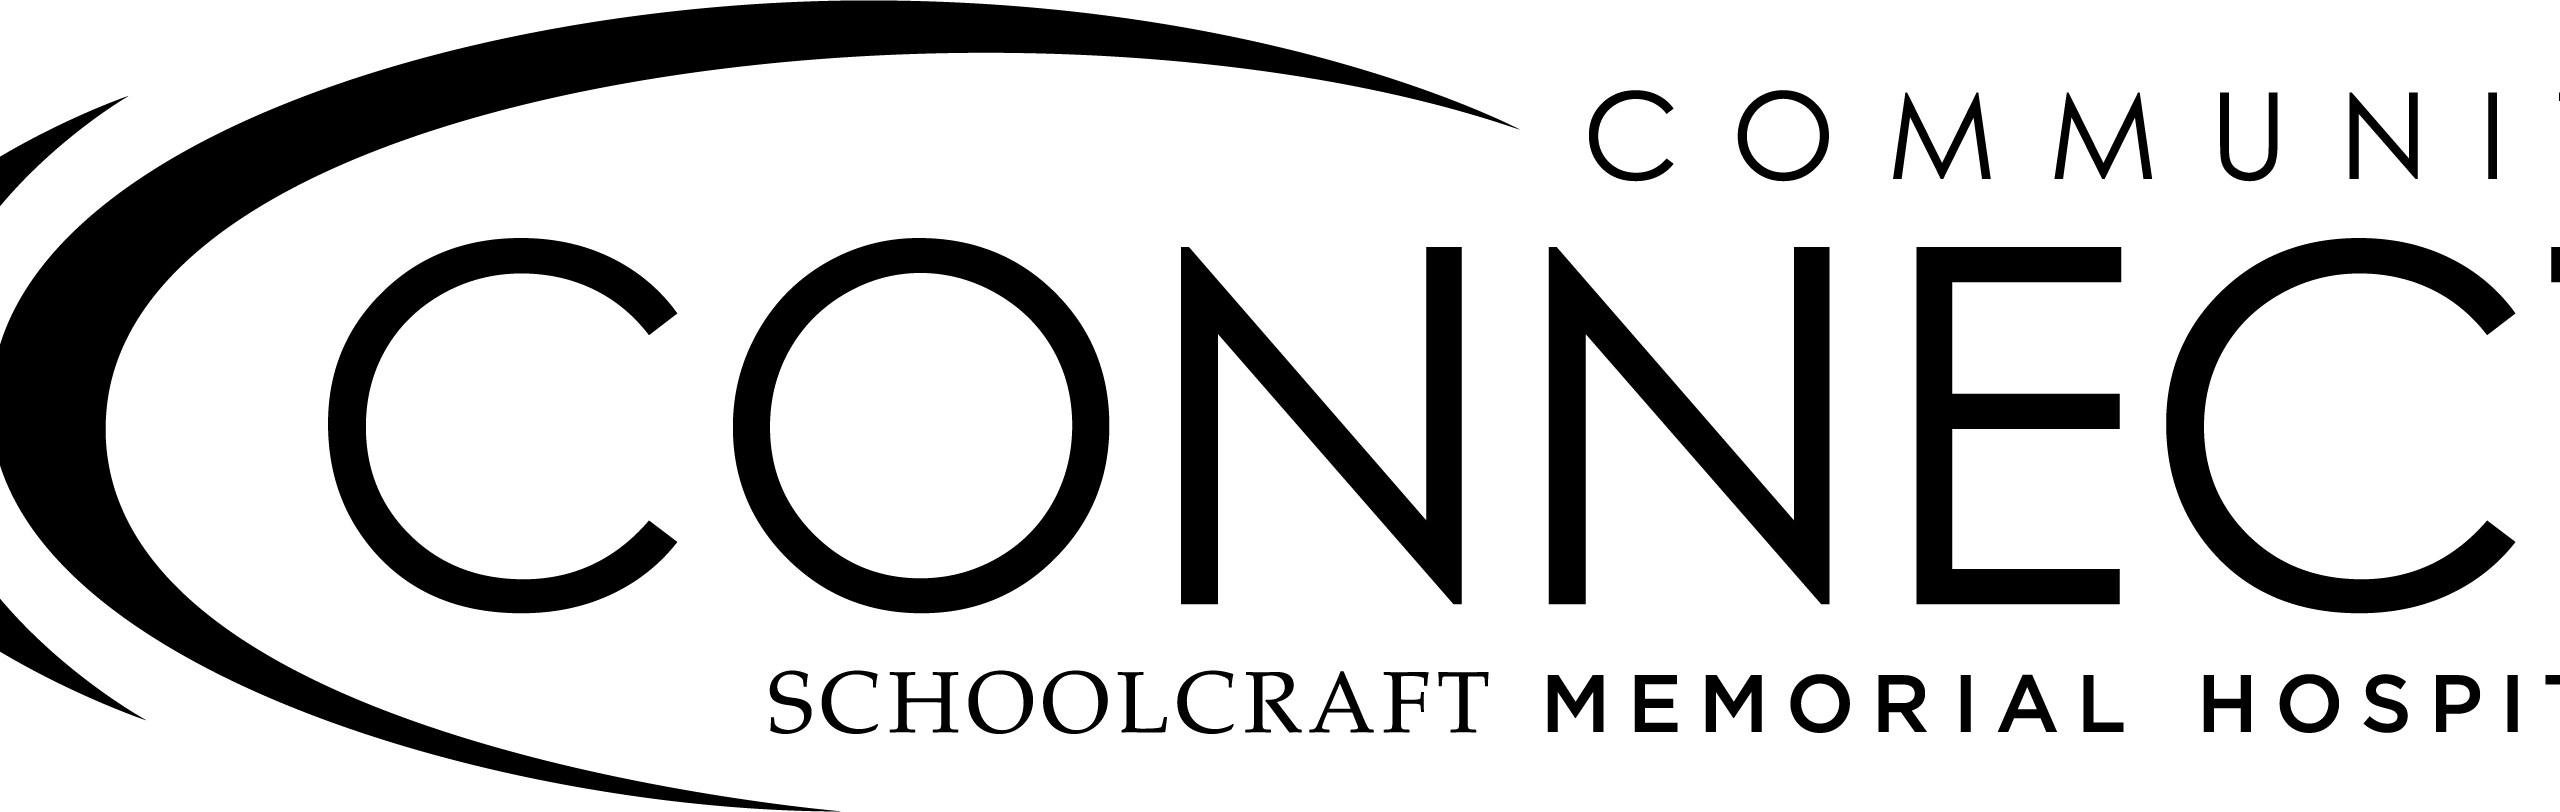 SCMH Community Connect Logo